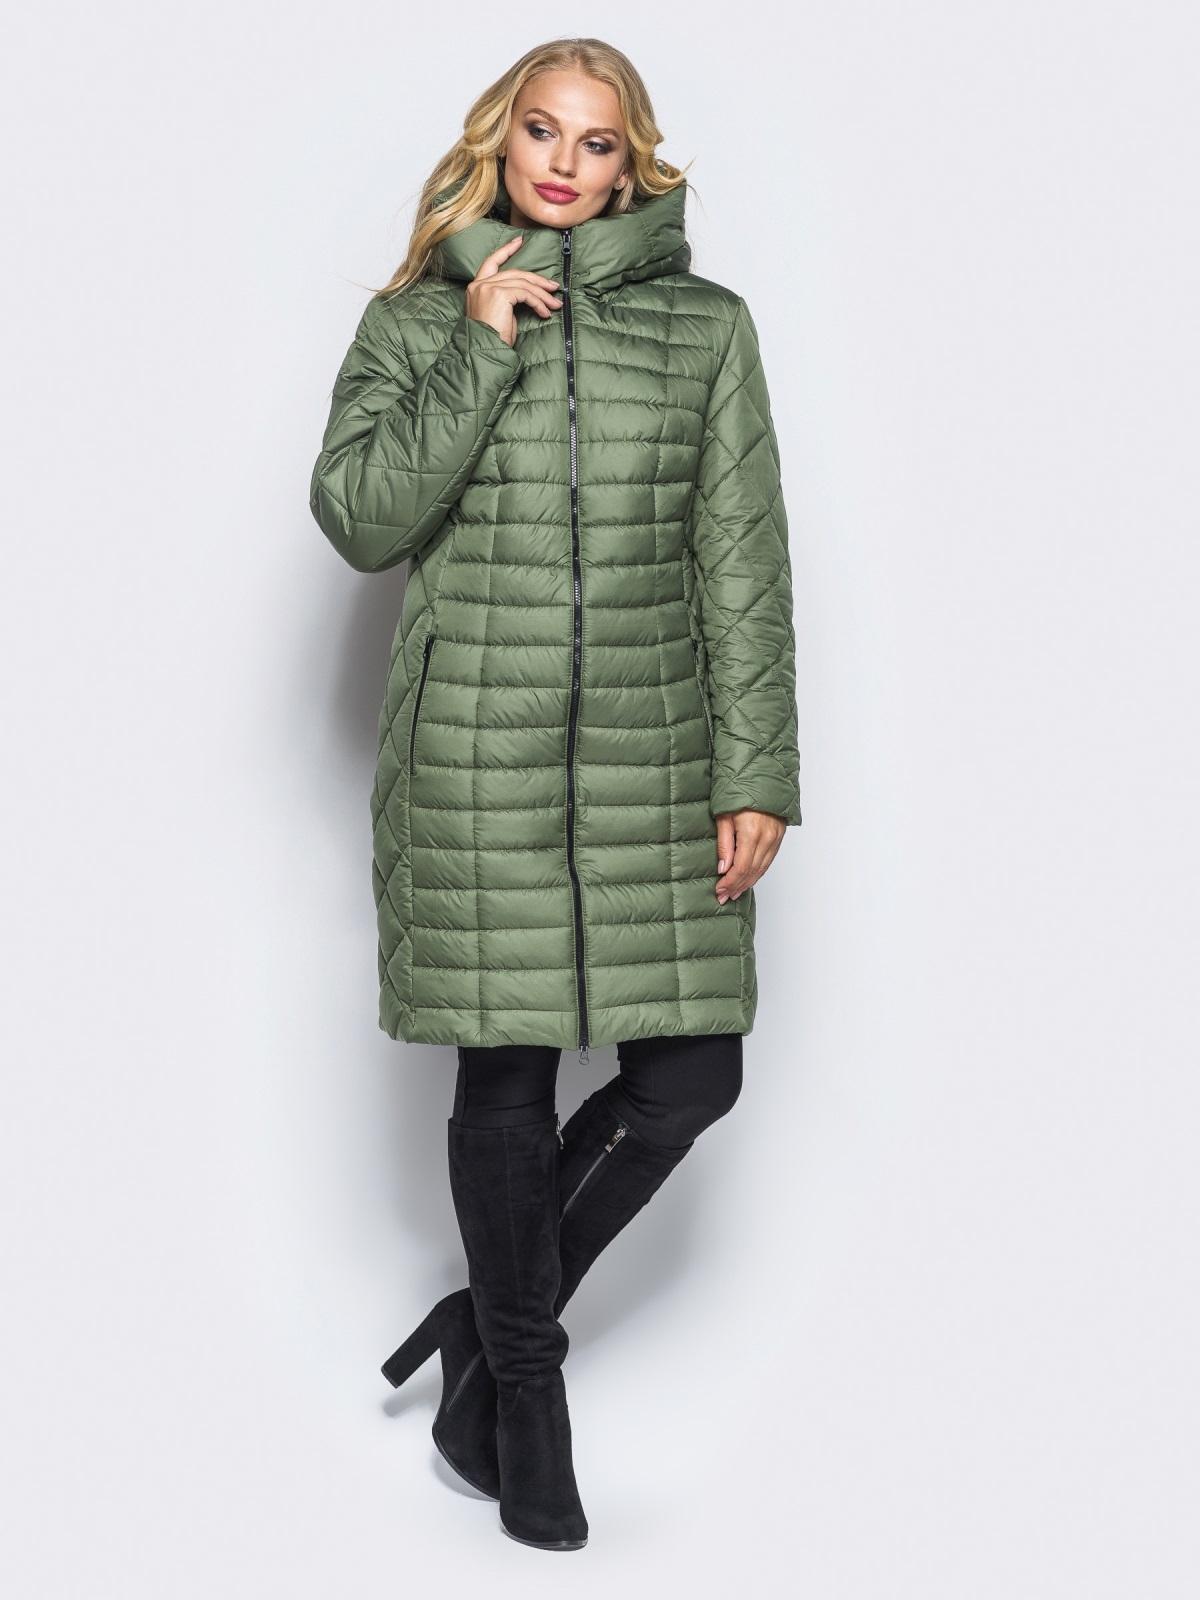 Зеленая зимняя куртка батал на змейке - 14708, фото 1 – интернет-магазин Dressa